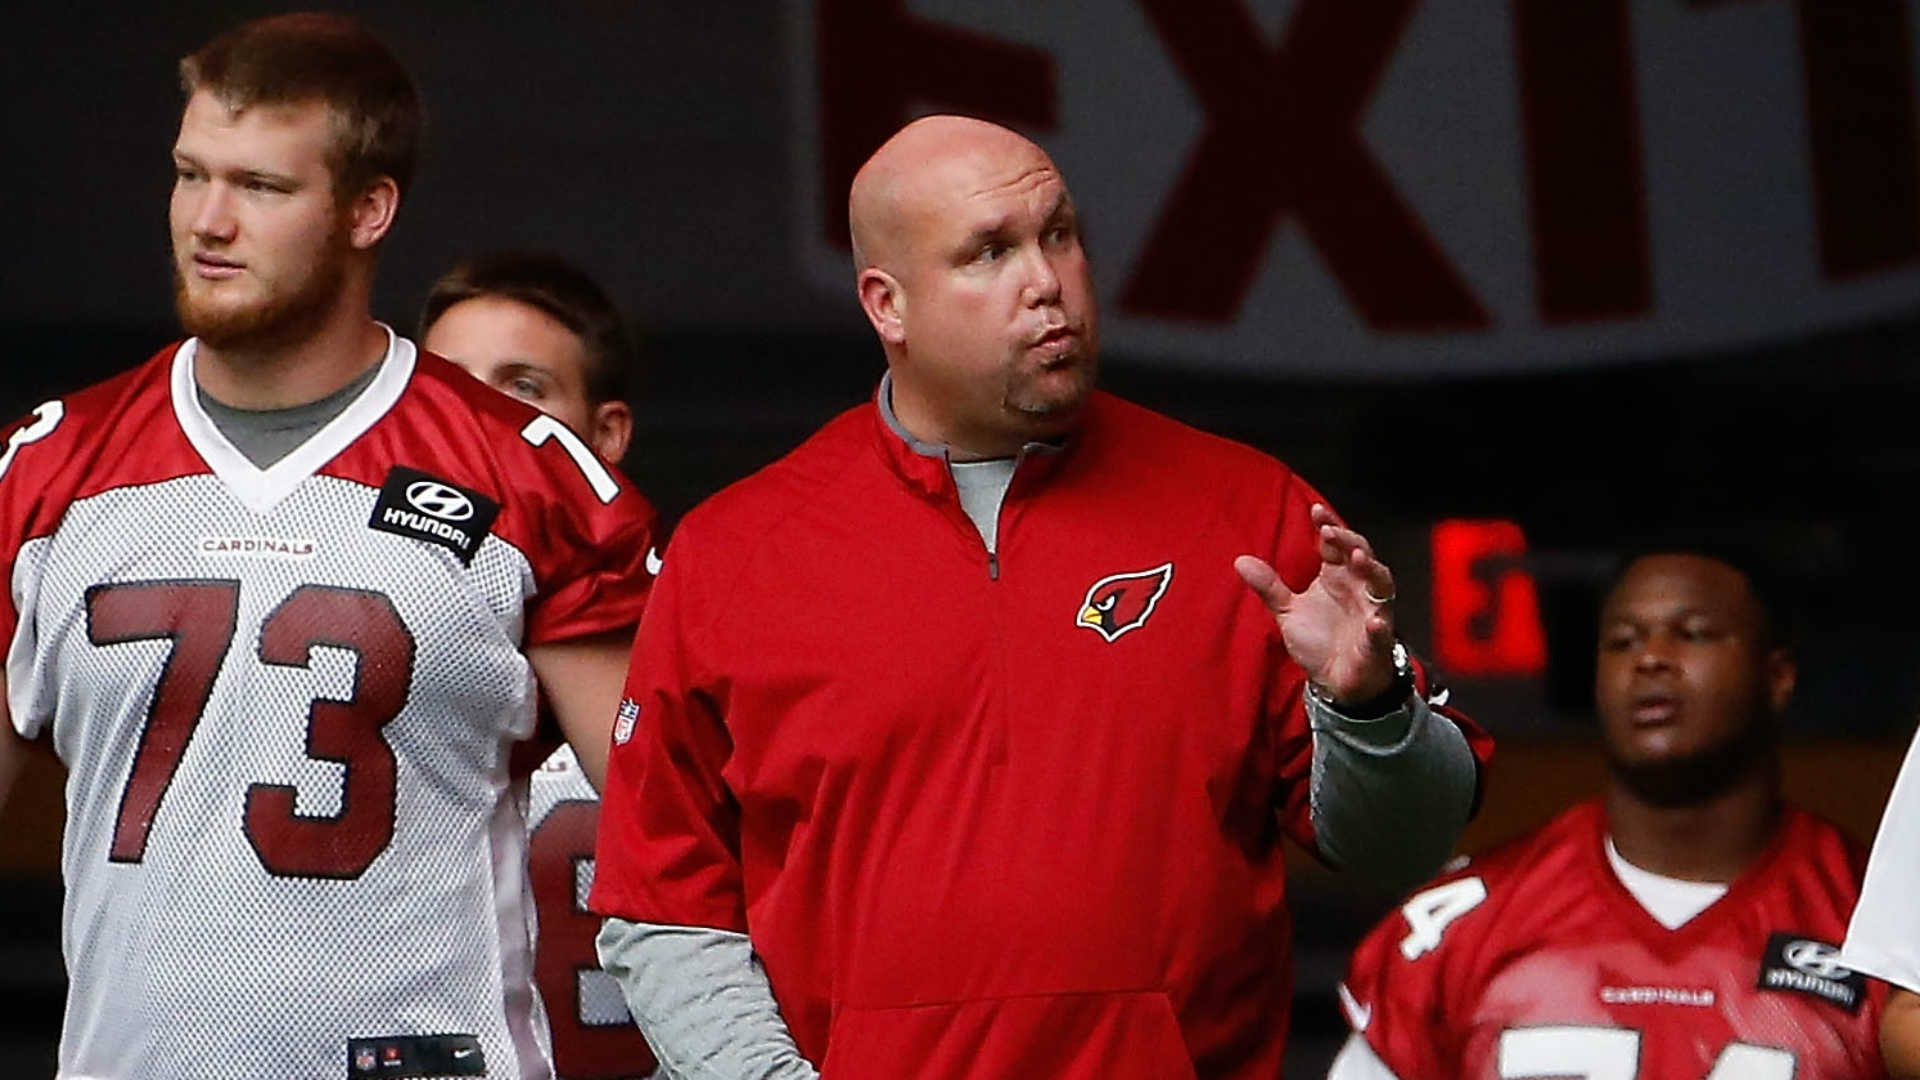 Cardinals' 2021 Draft Pick: Who Took Arizona?  Full list of NFL Draft selections